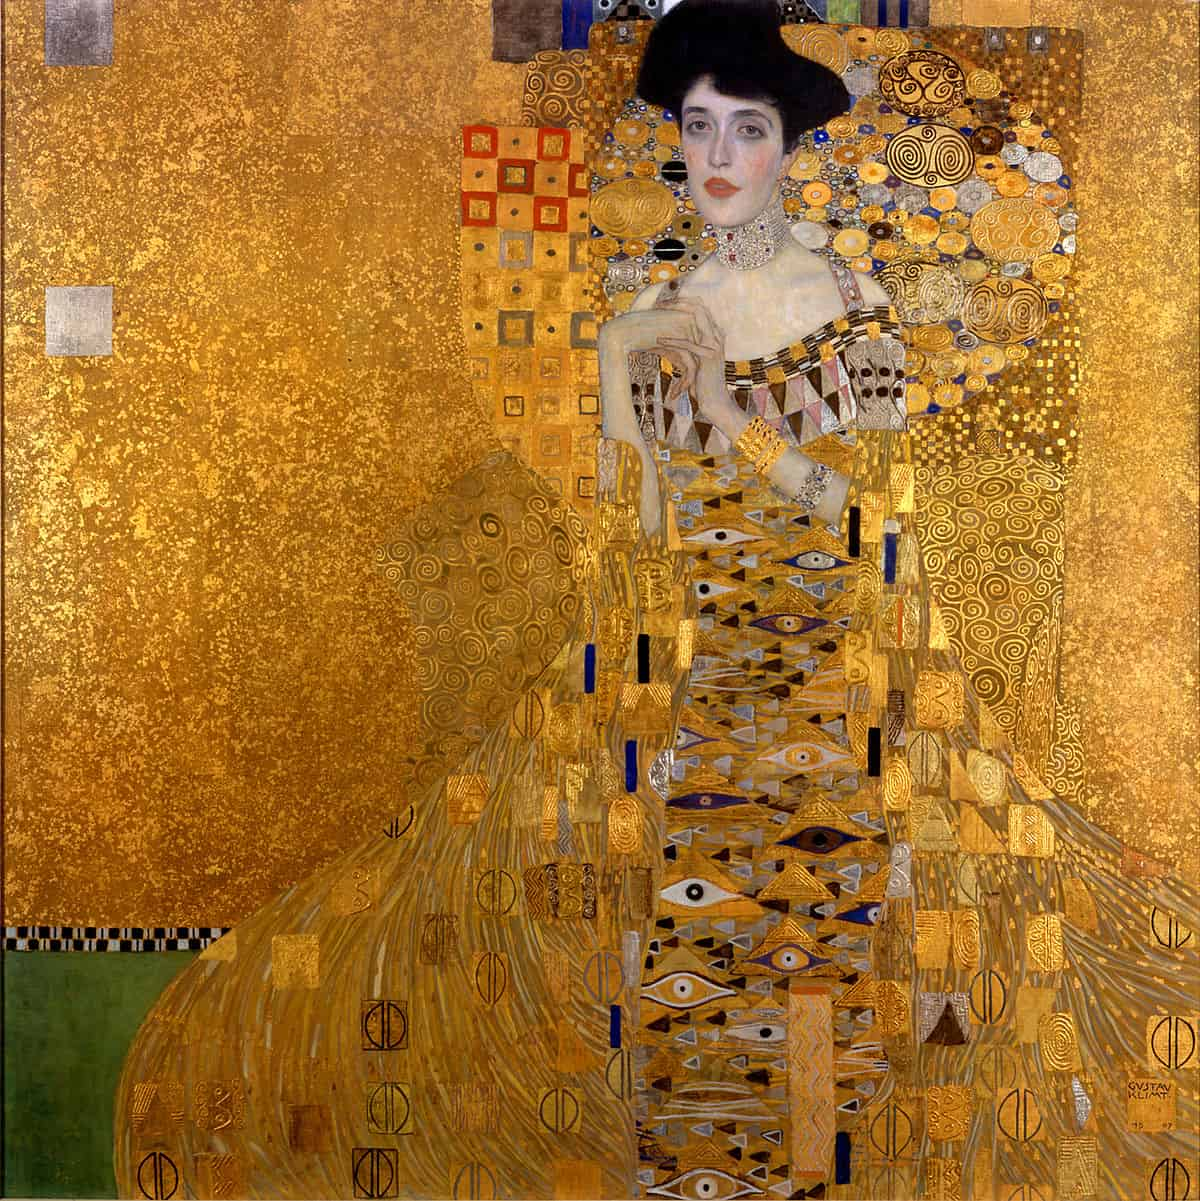 Gustav_Klimt_Portrait of Adele Bloch Bauer I, 1907